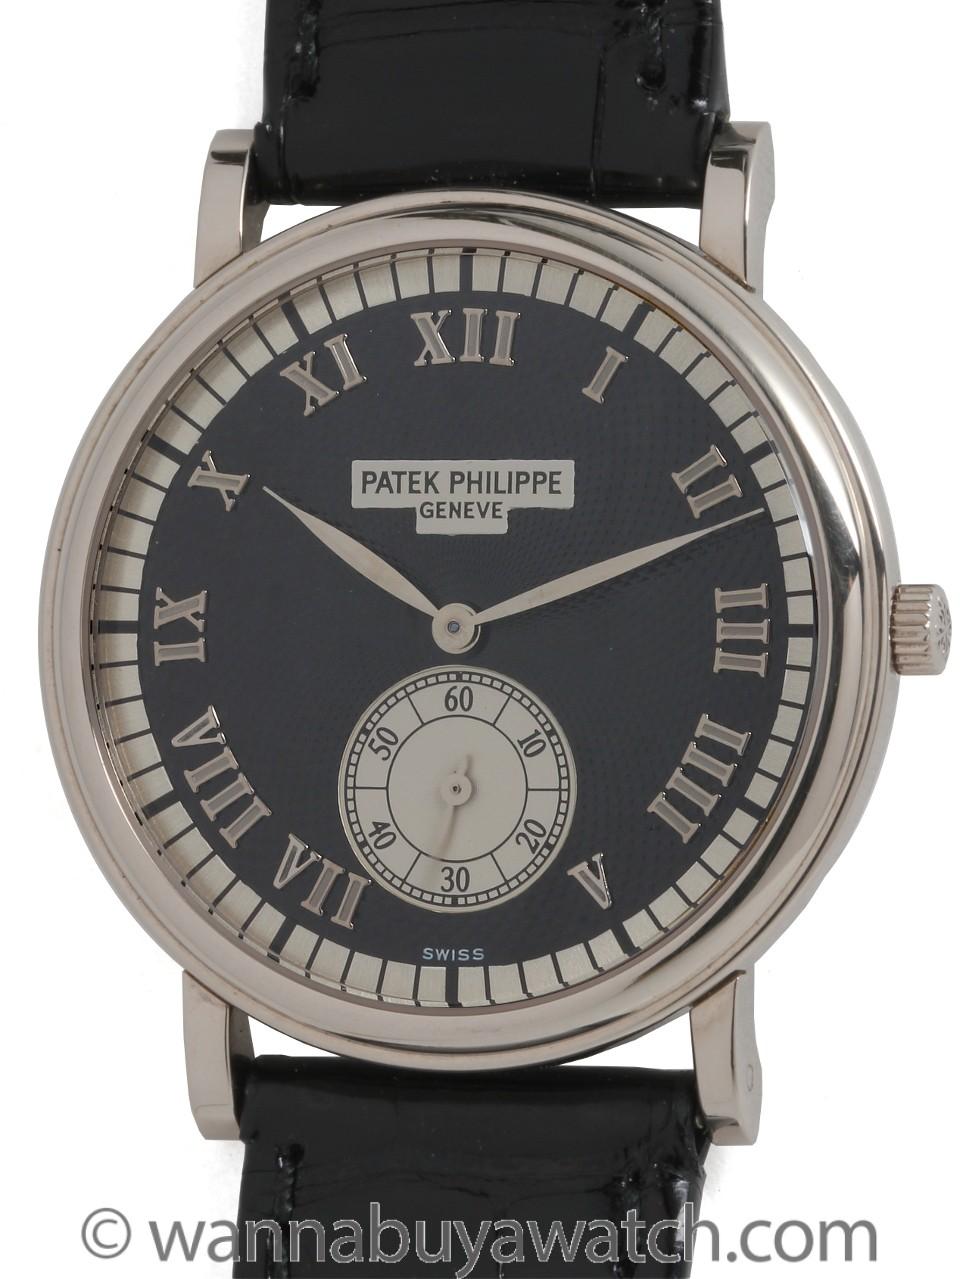 Patek Philippe 18K WG ref 5022G circa 1990's